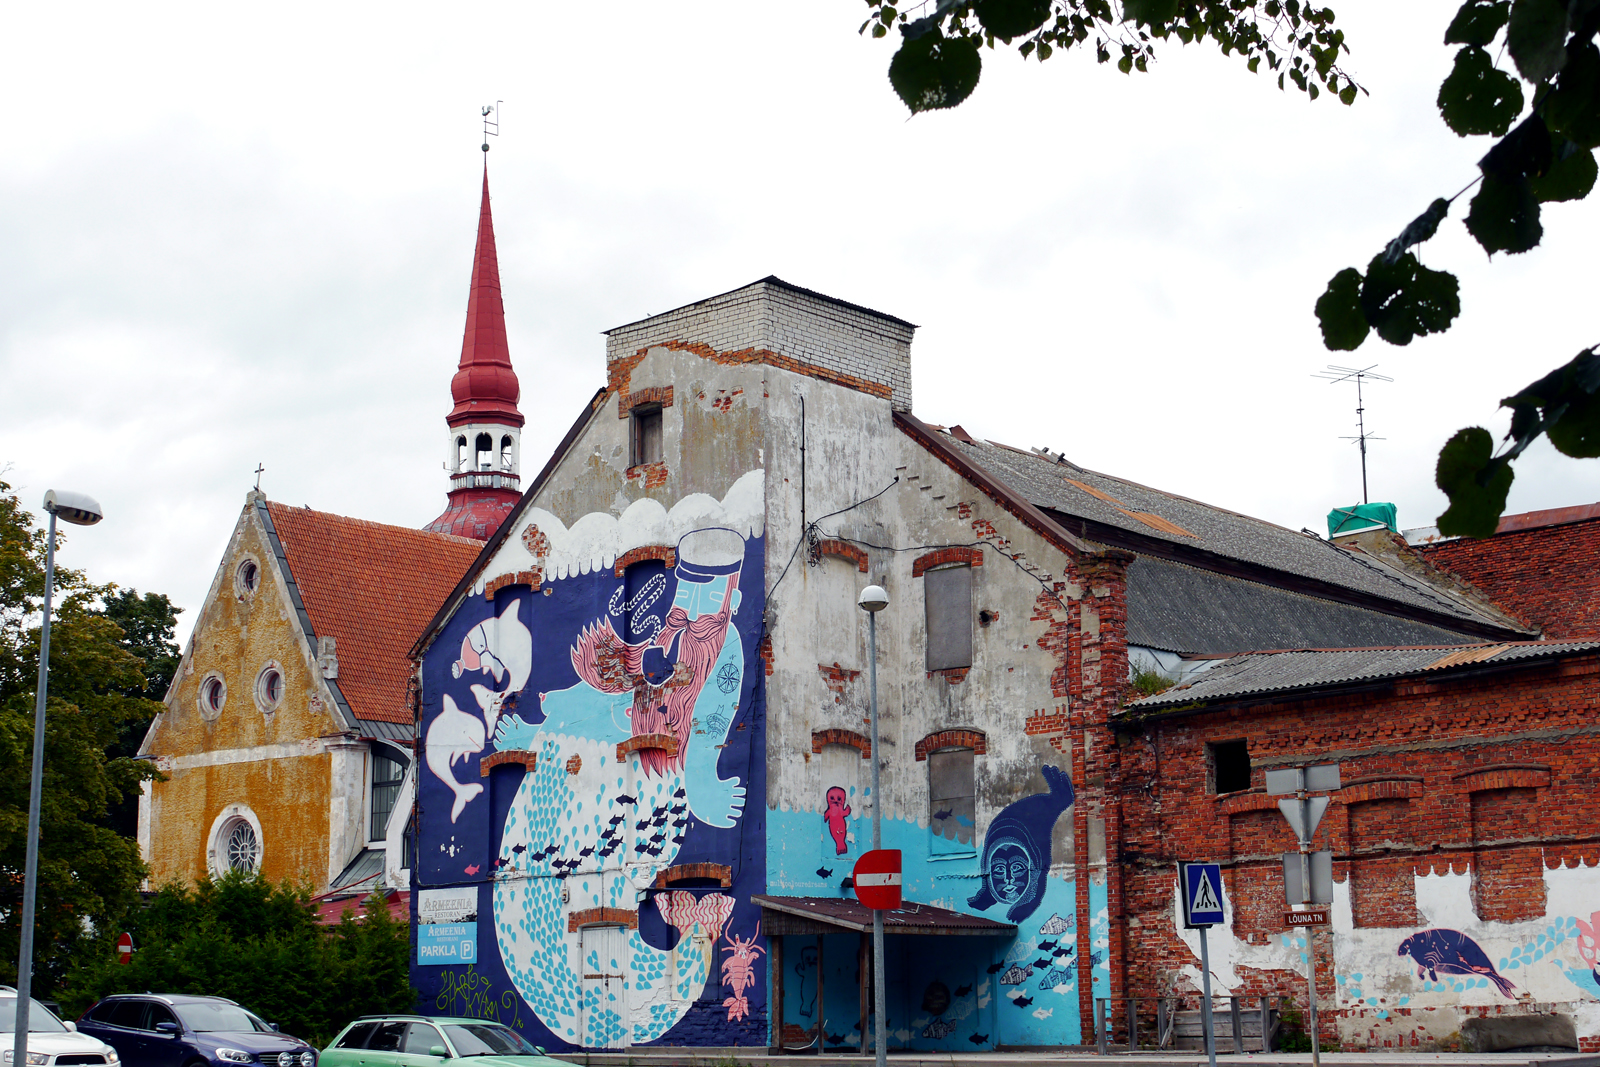 Pärnu-Estland-Estonia-Streetart